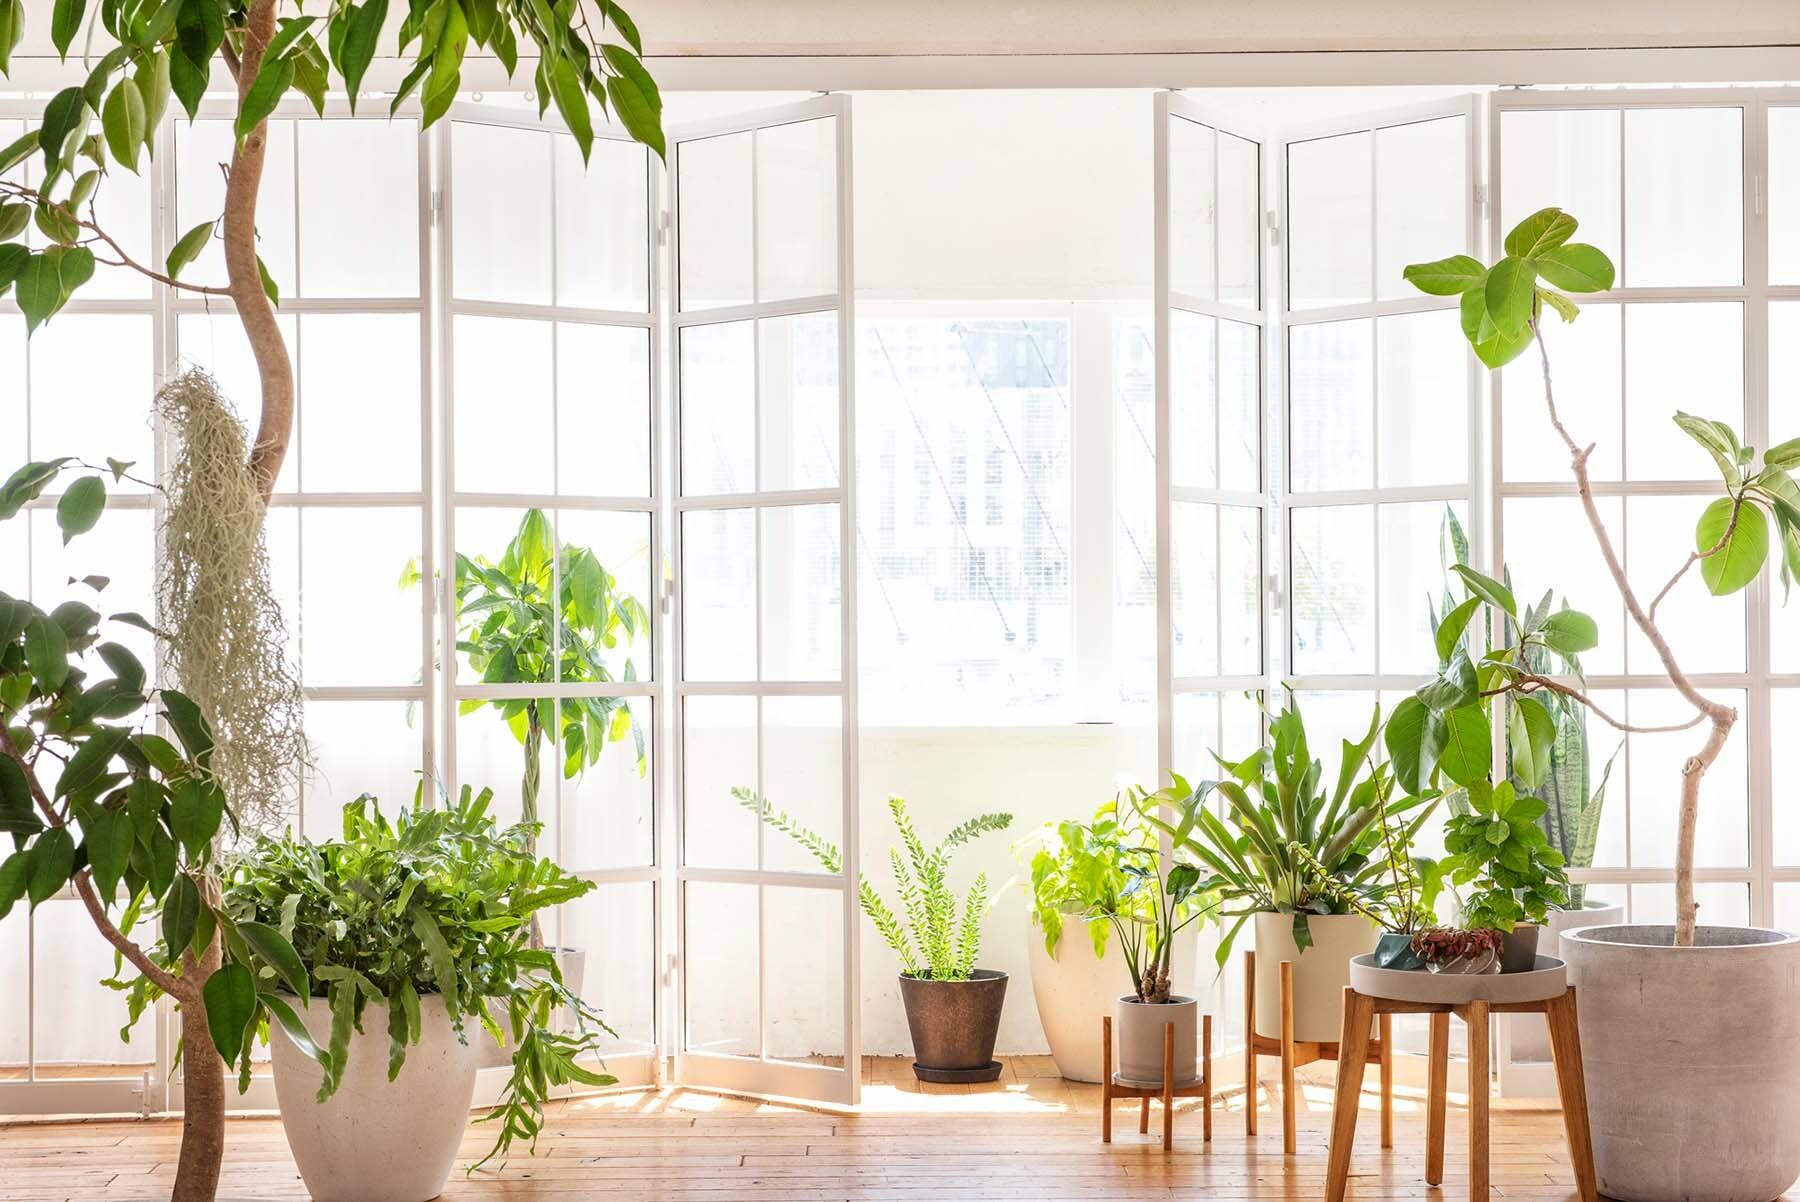 StudioBRICK 3F (スタジオブリック八丁堀3F)スチール扉は開閉可能